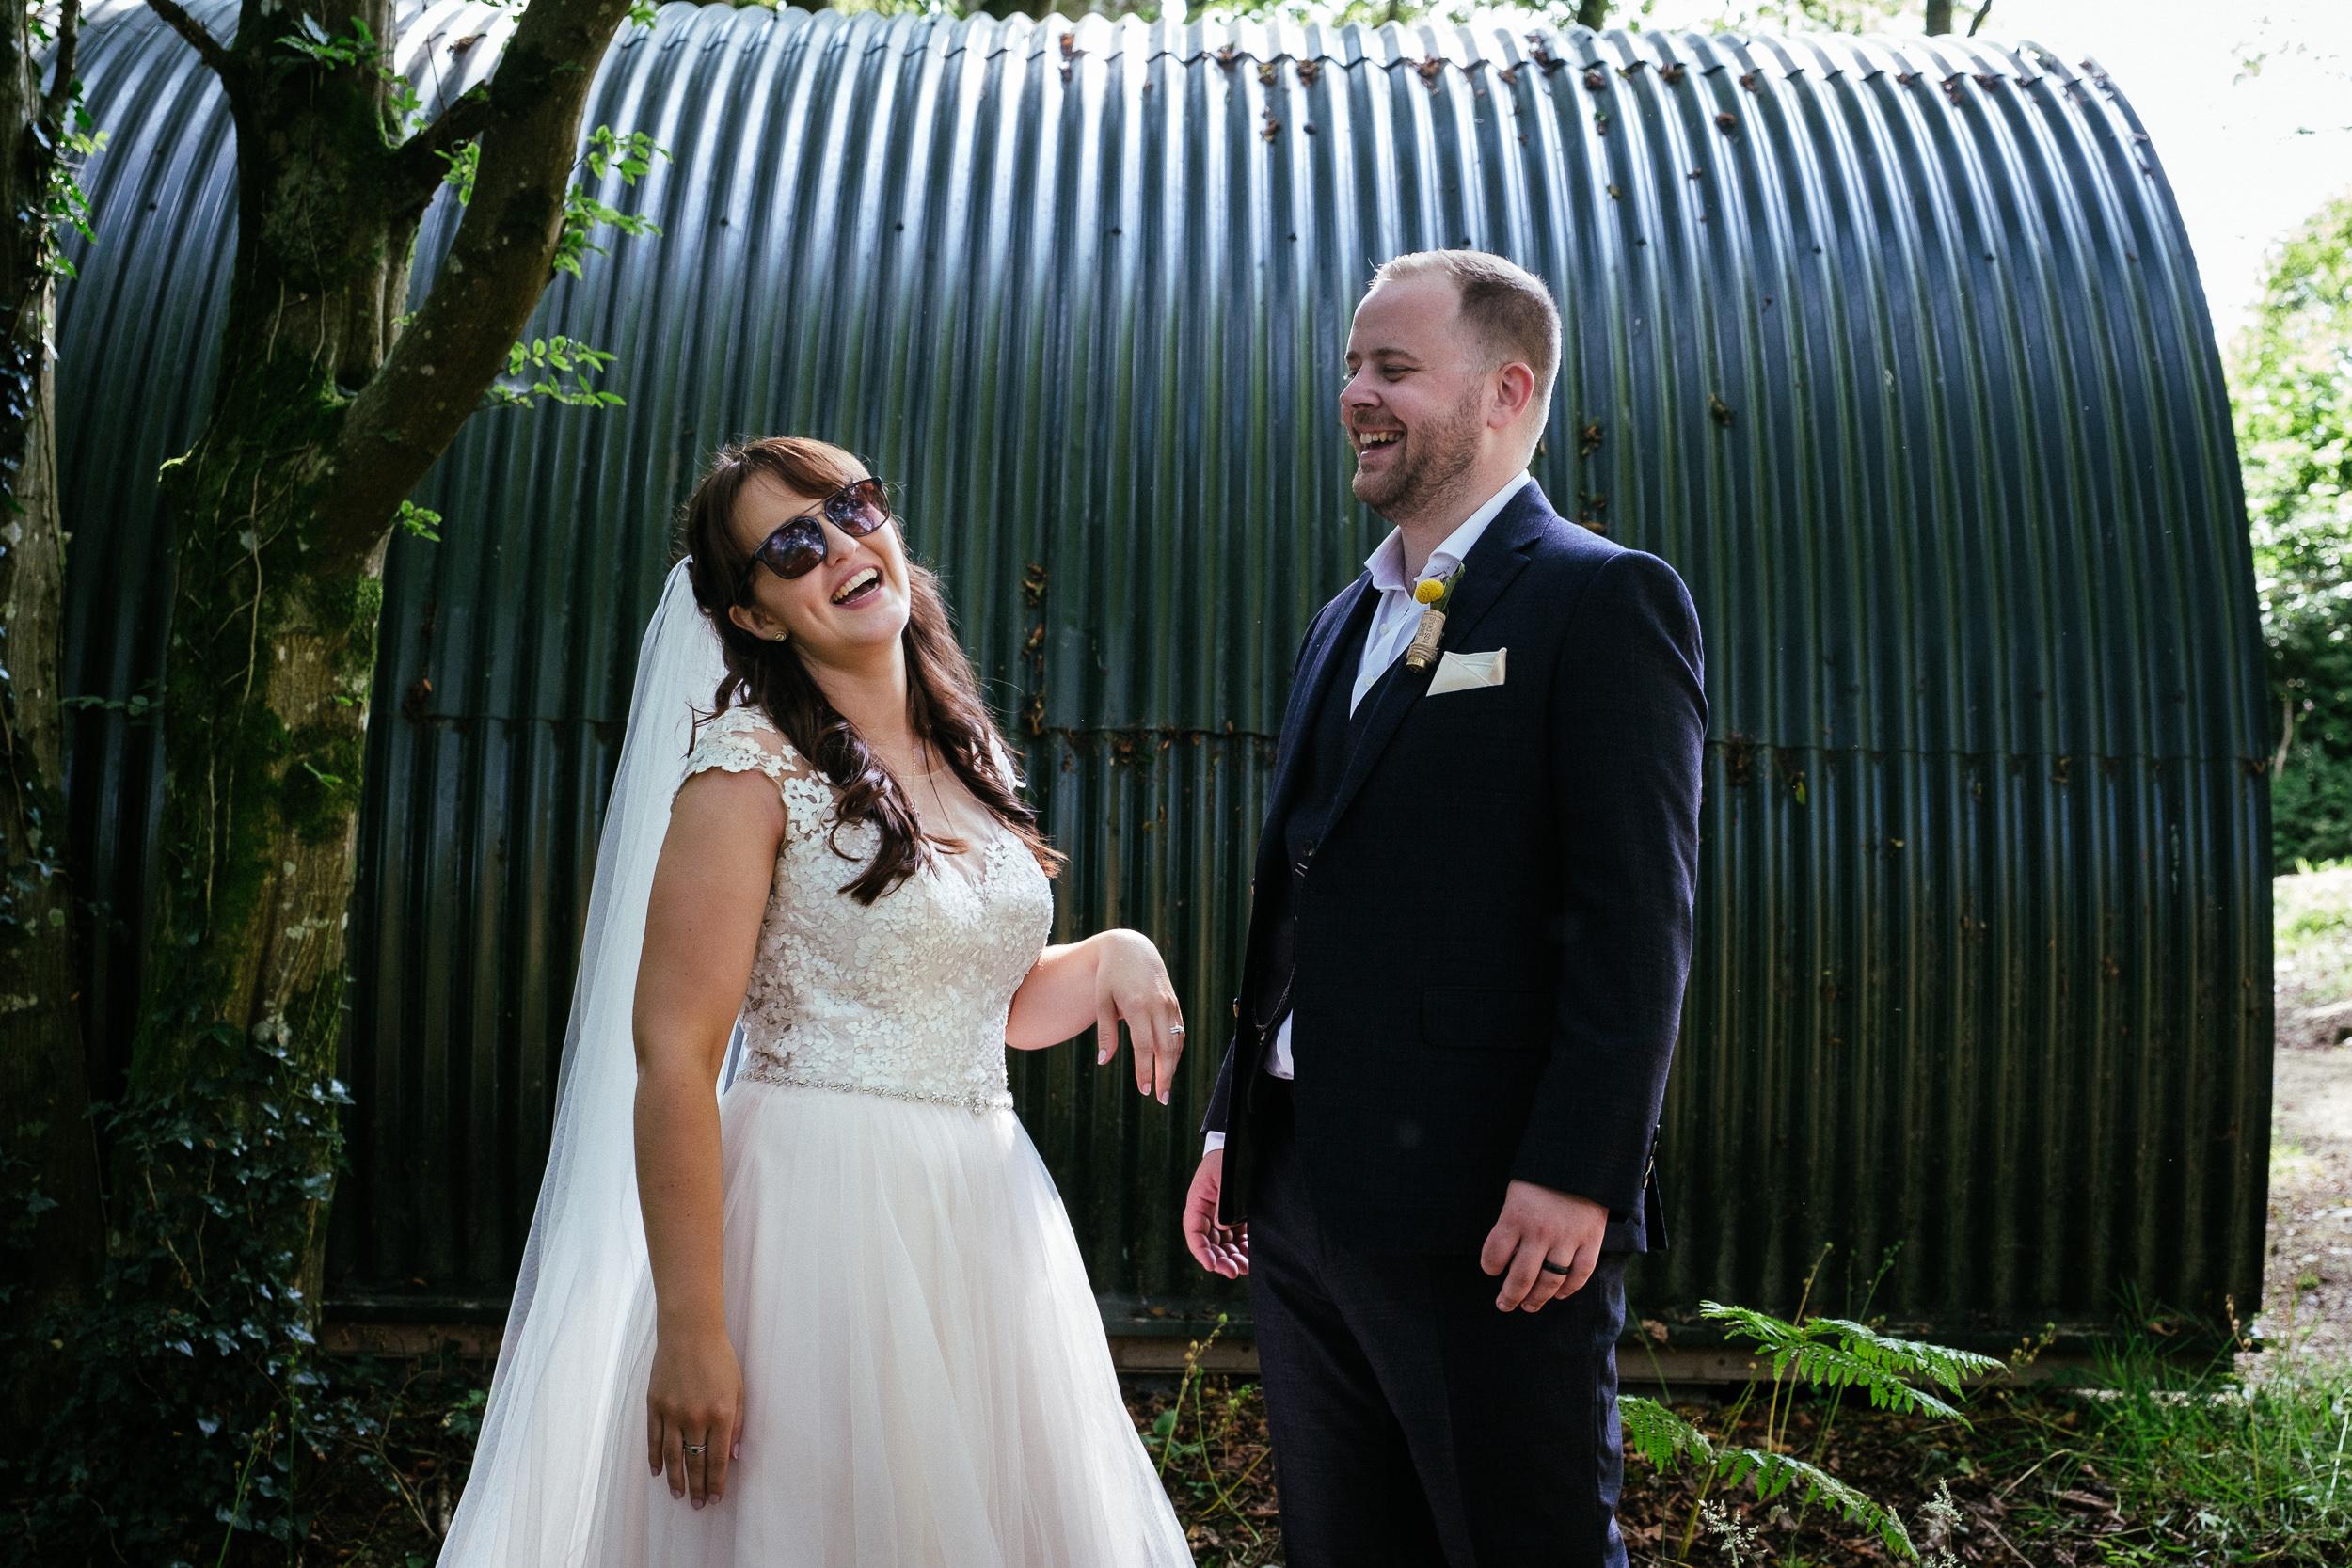 bride laughing wearing sunglasses